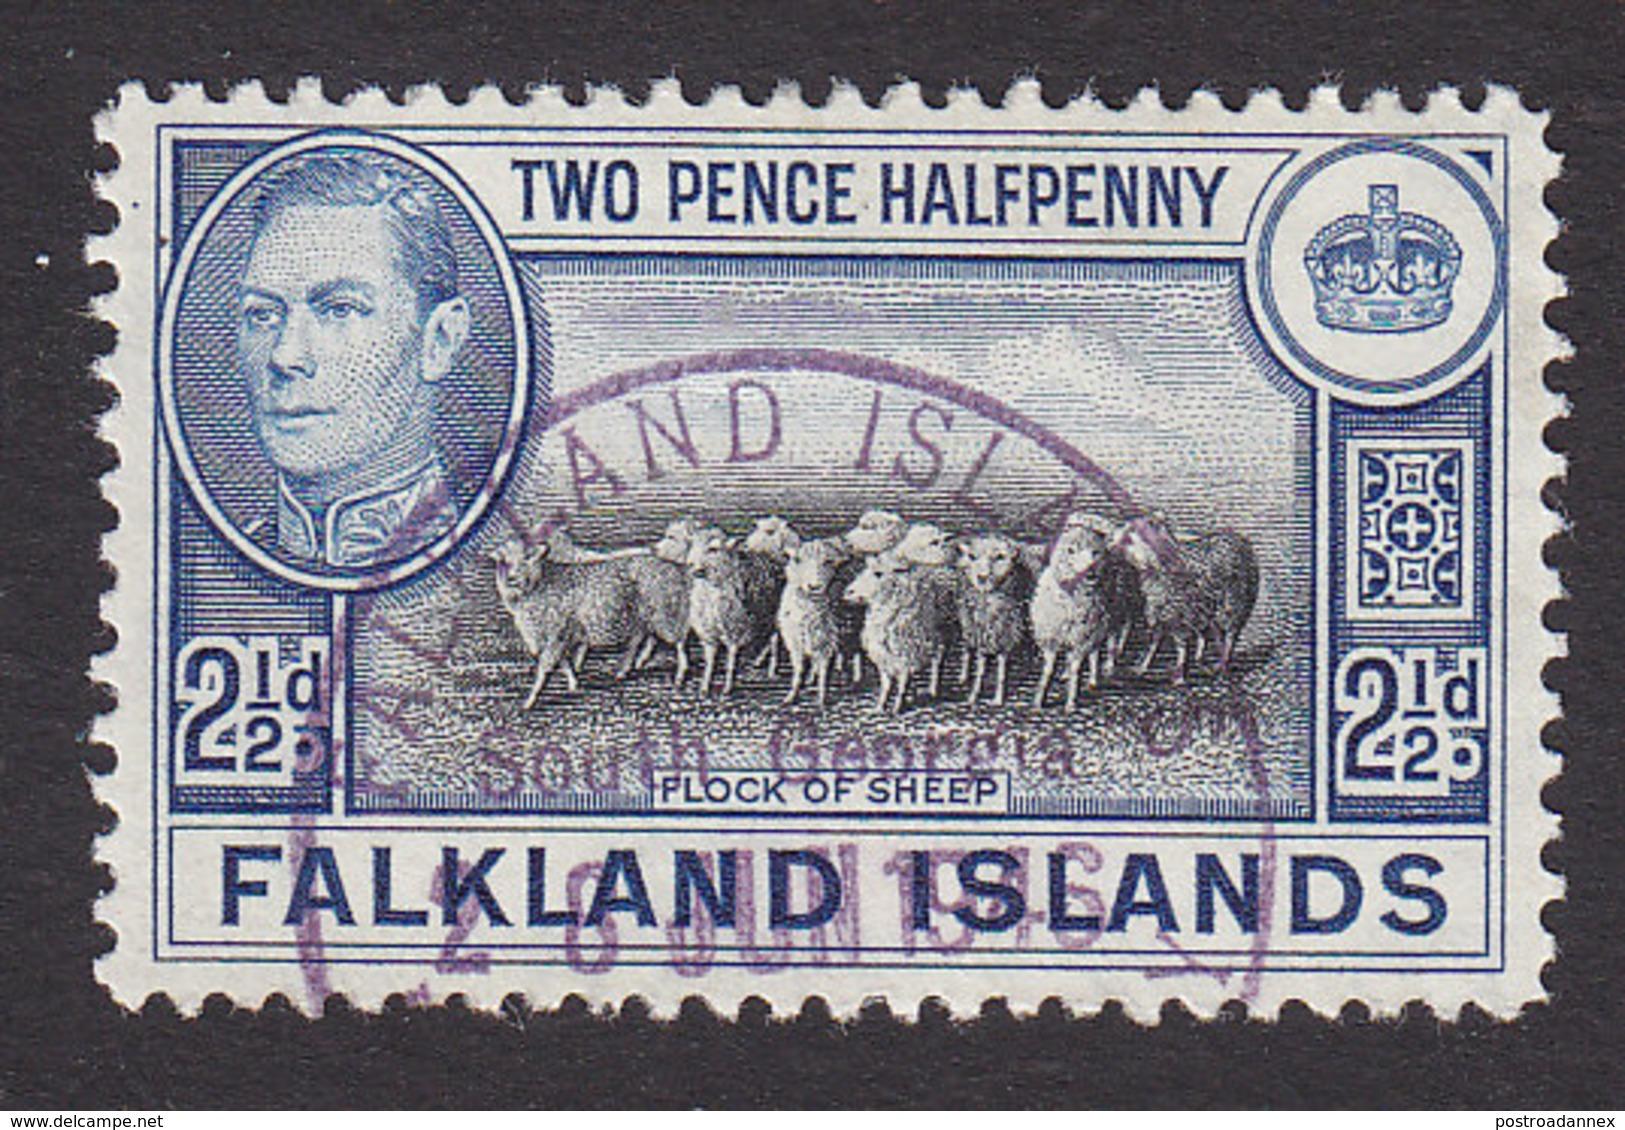 Falkland Islands, Scott #87, Used, George VI And Scenes Of Falkland Islands, Issued 1938 - Falkland Islands